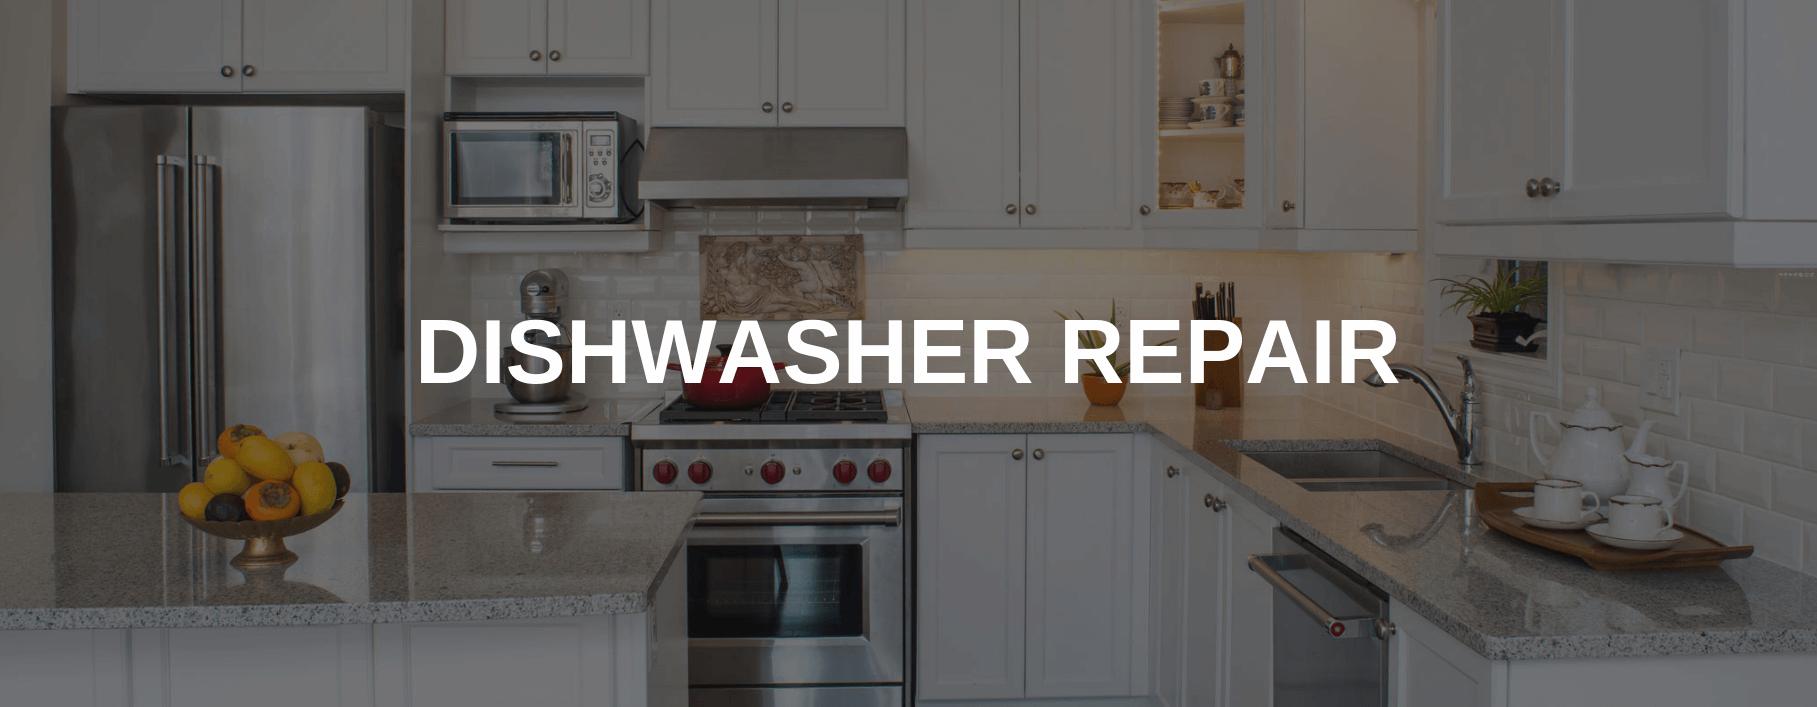 dishwasher repair chicago